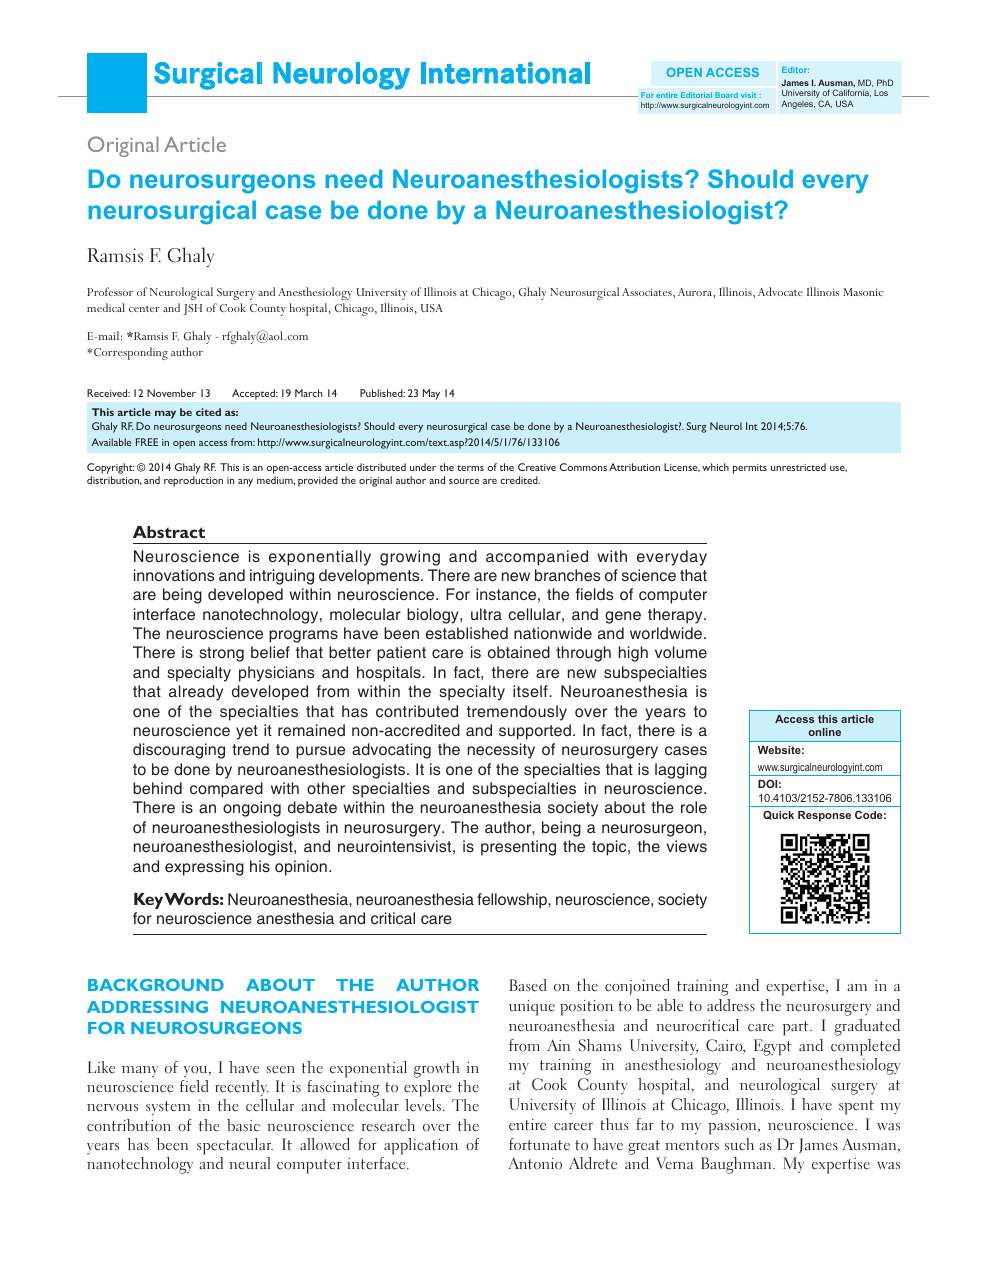 Do neurosurgeons need Neuroanesthesiologists? Should every